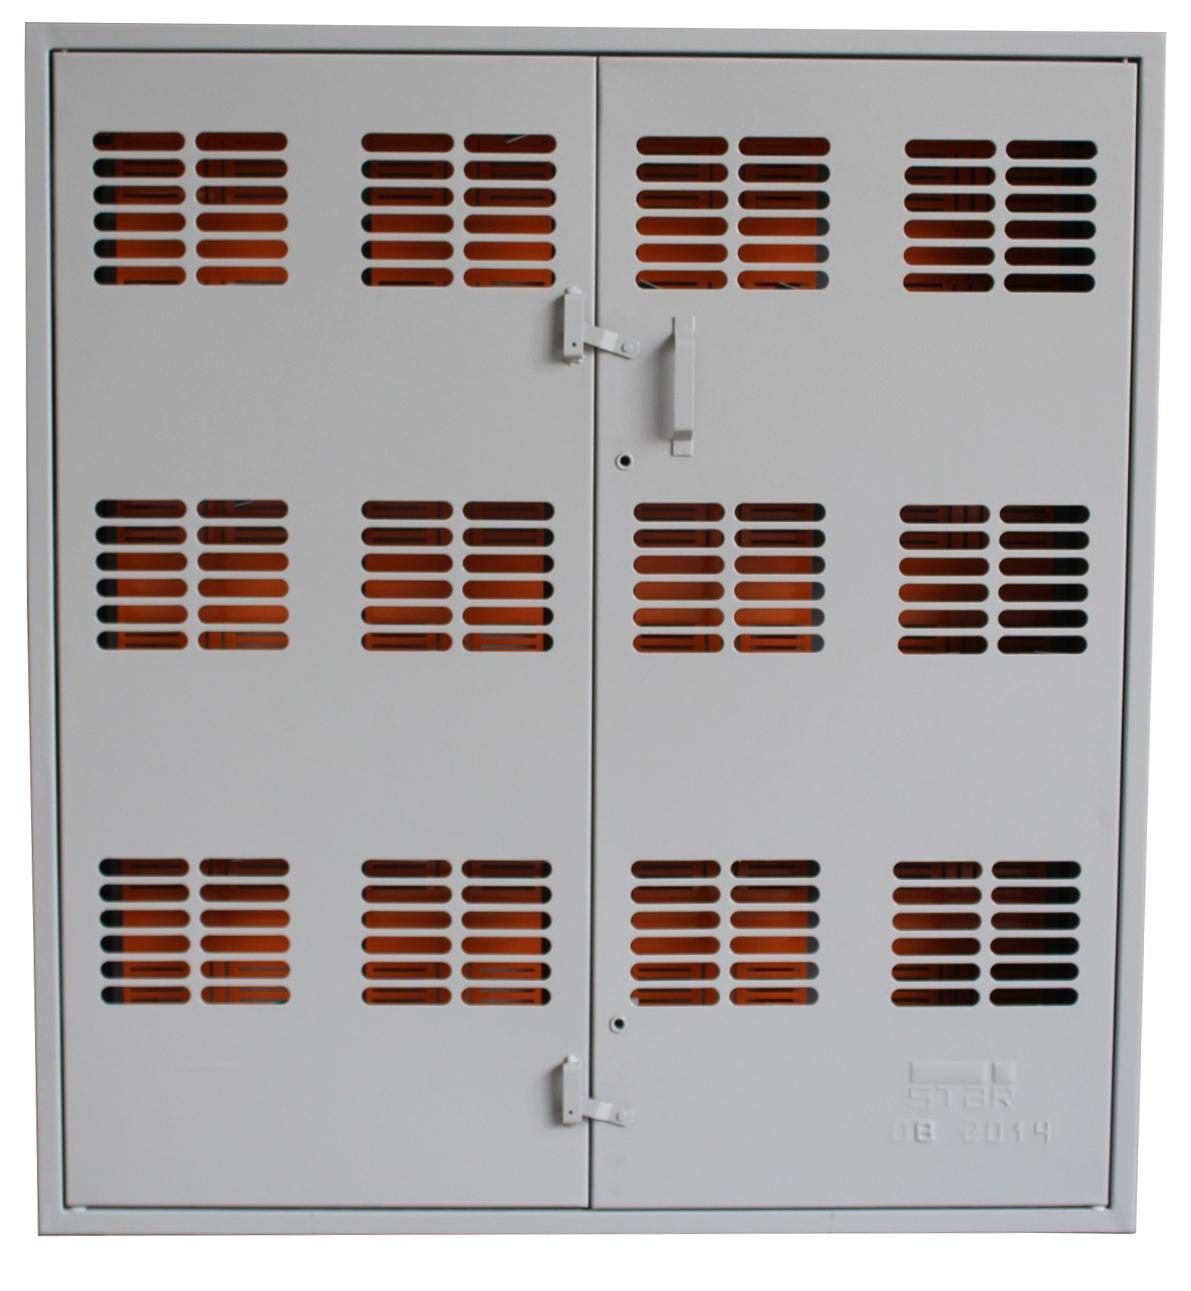 Caixa De Medição Agrupada Tipo N (12 Medidores) ENEL - Starmetal – Eletrometalúrgica